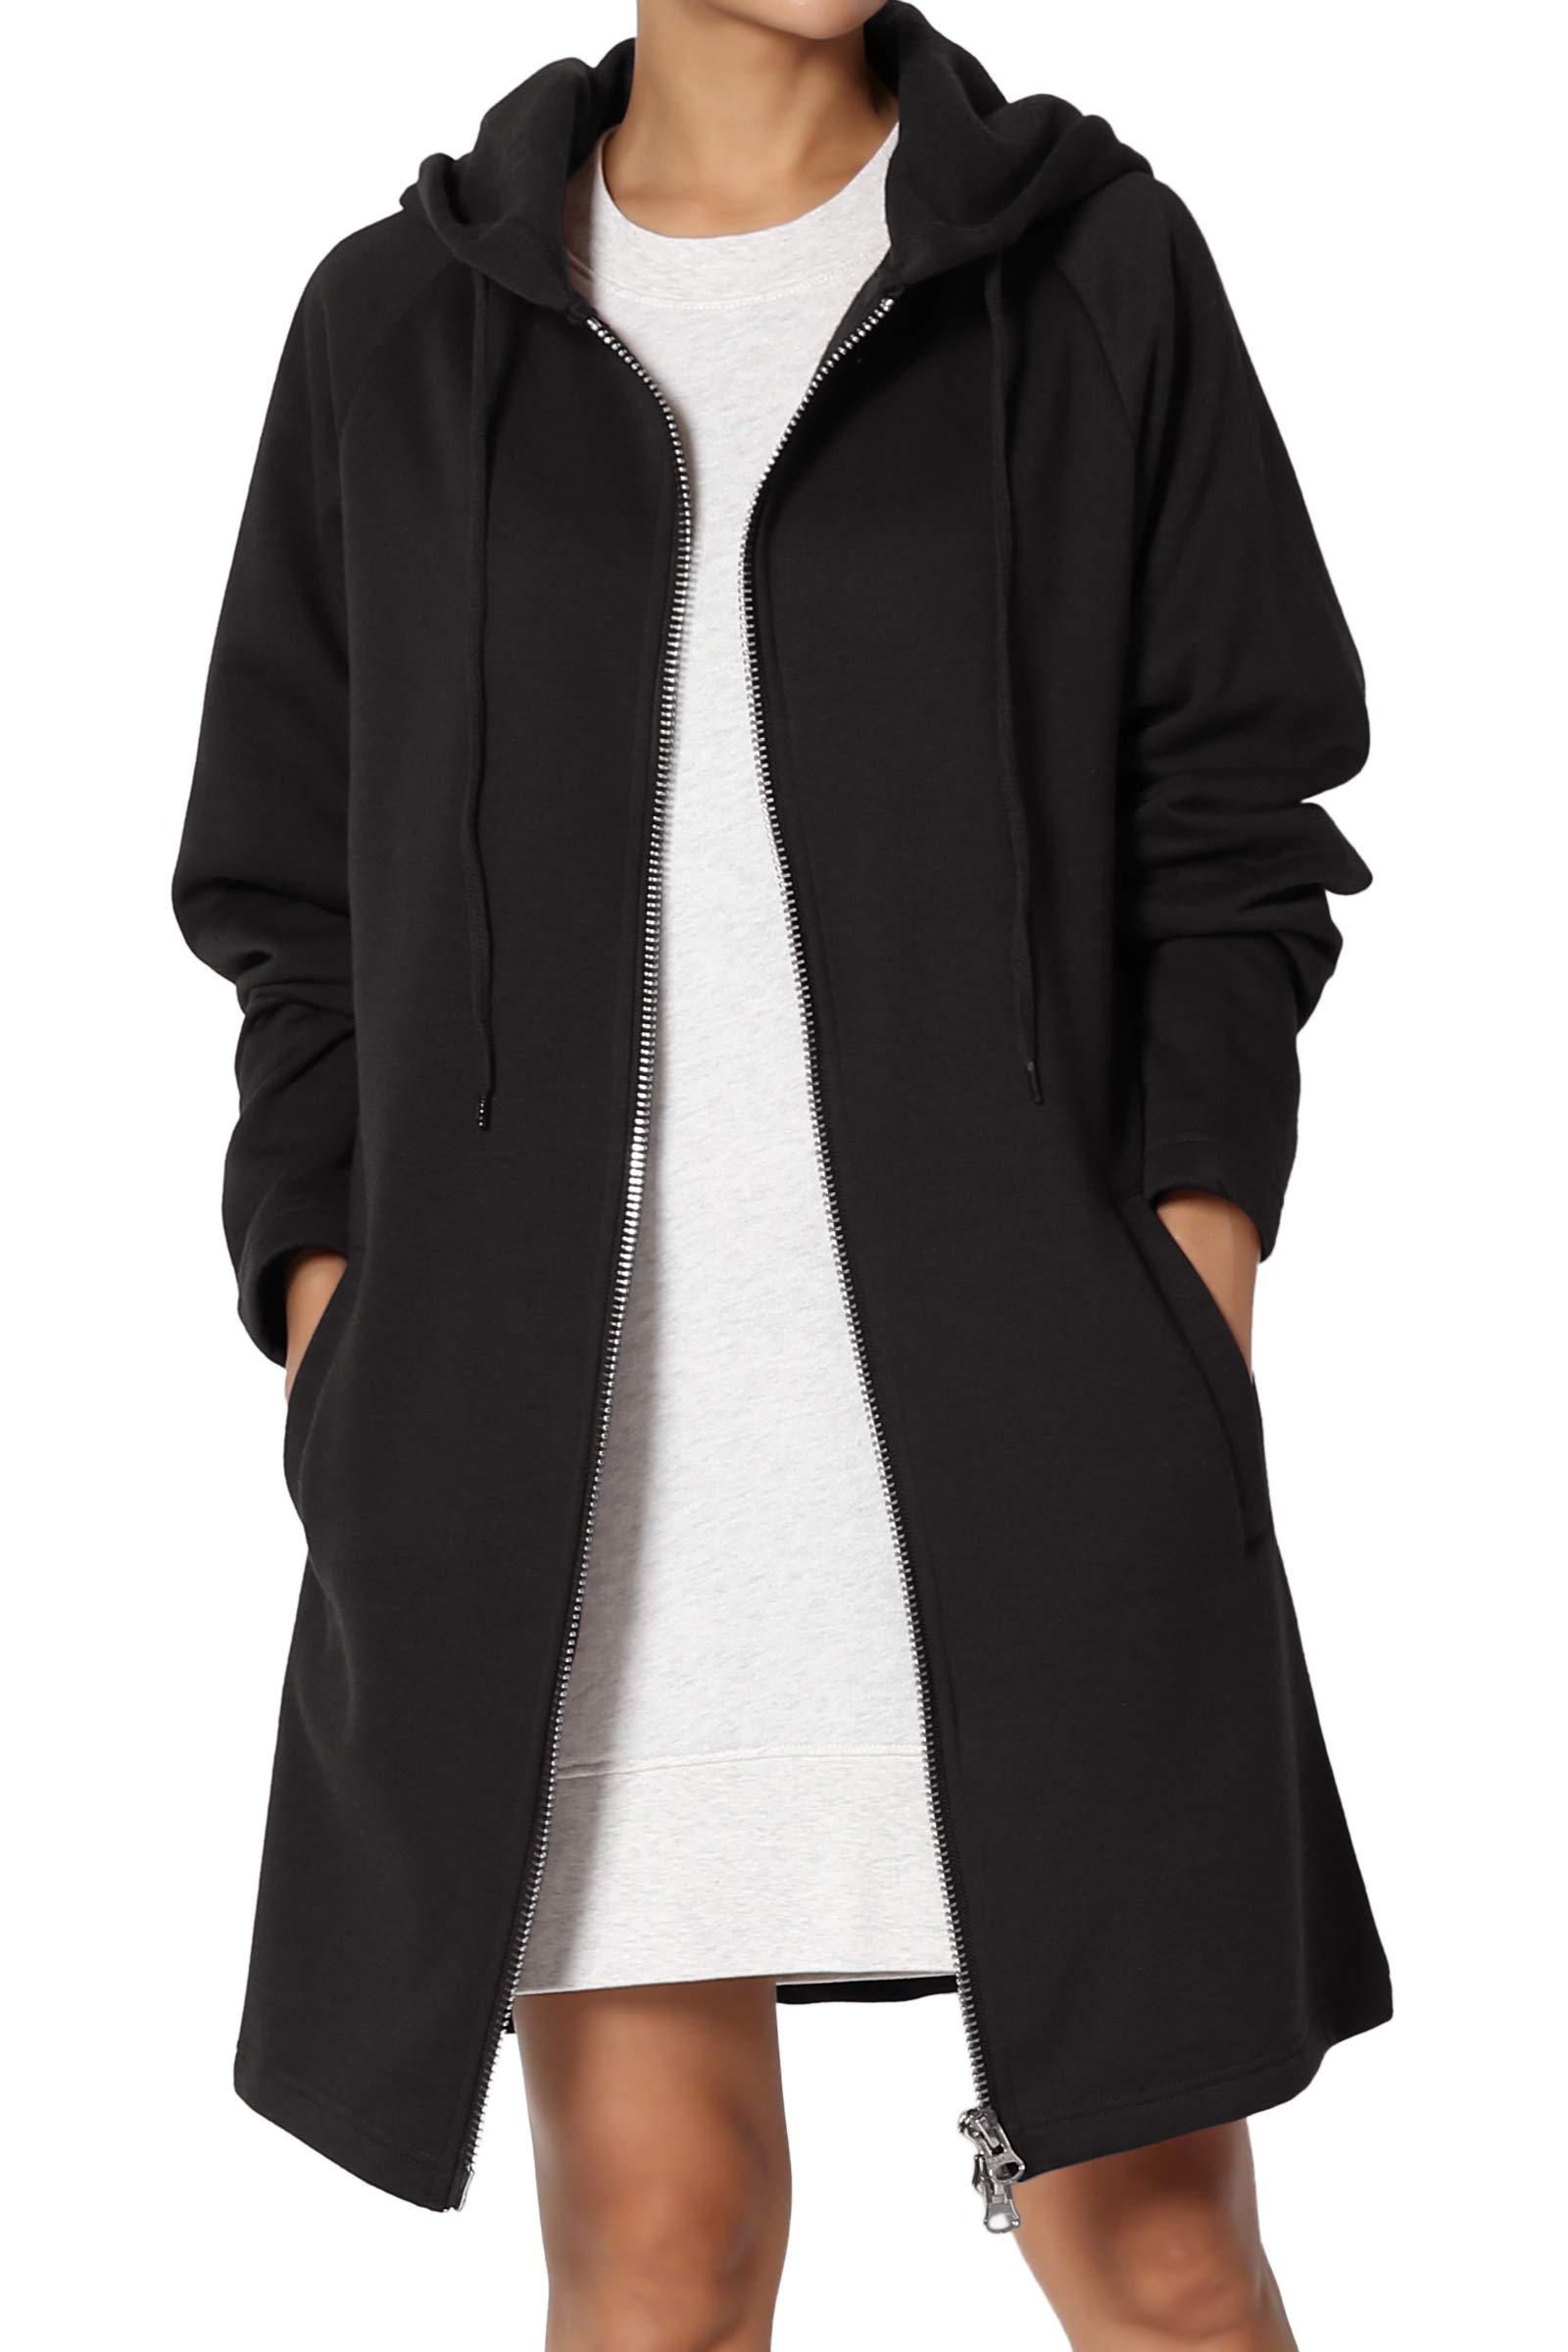 TheMogan Women's Hoodie Oversized Zip Up Long Fleece Sweat Jacket Black M/L by TheMogan